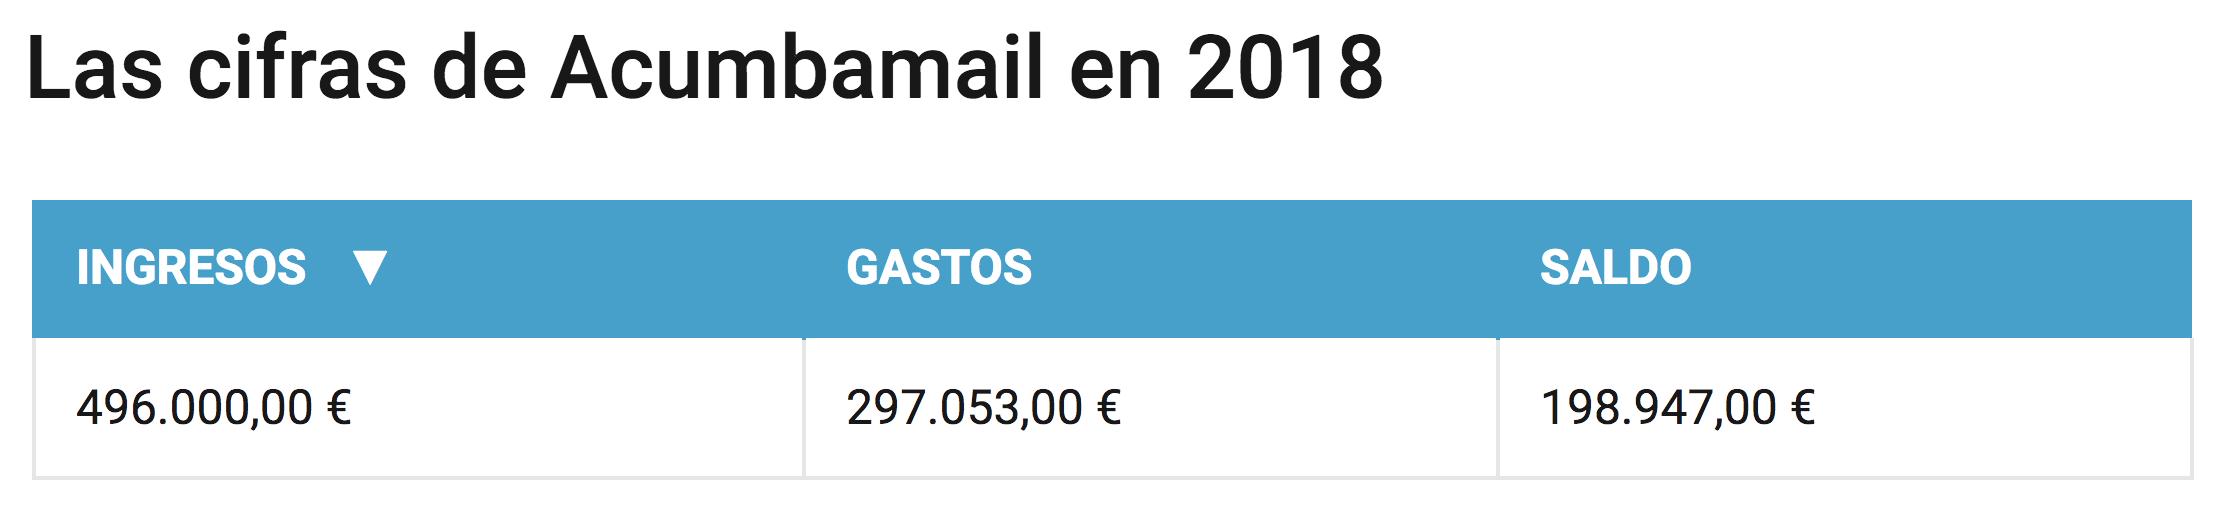 ingresos y gastos acumbamail